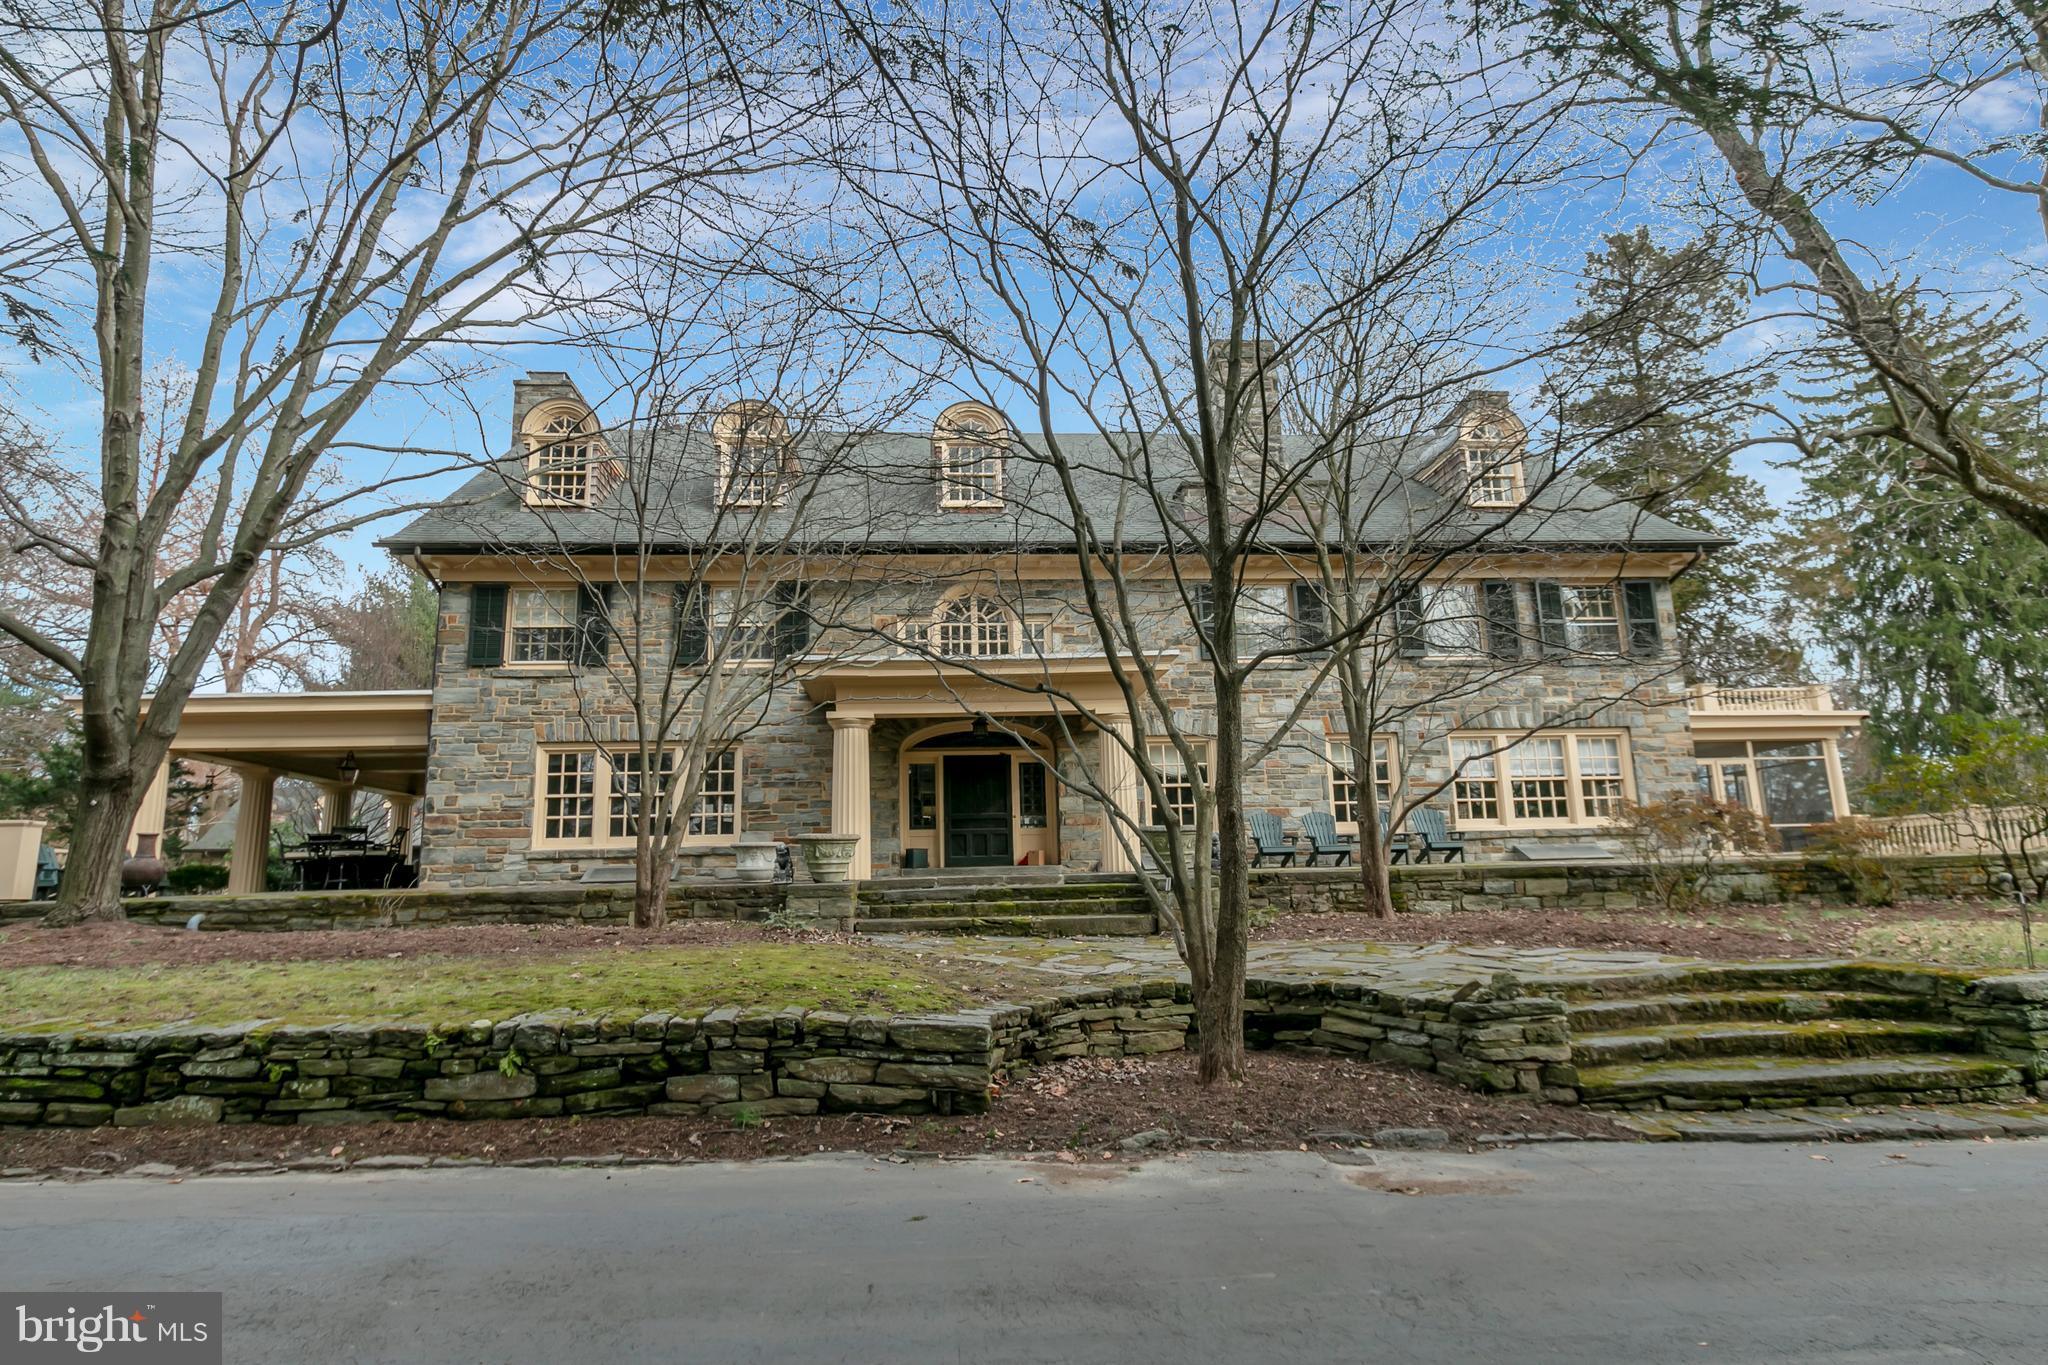 40 Wellesley Rd, Swarthmore, PA, 19081